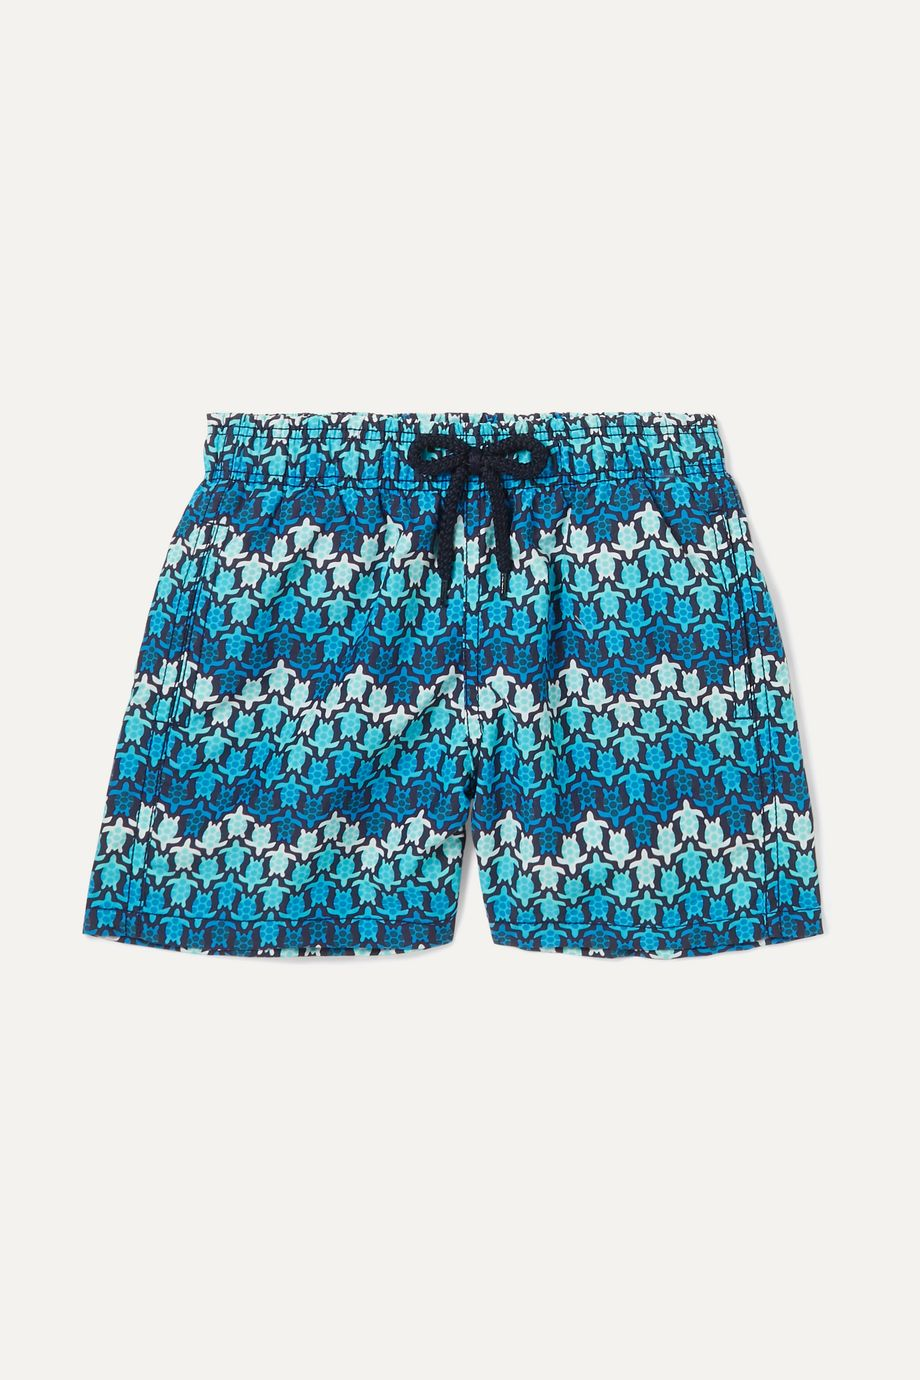 Vilebrequin Kids Printed shell swim shorts